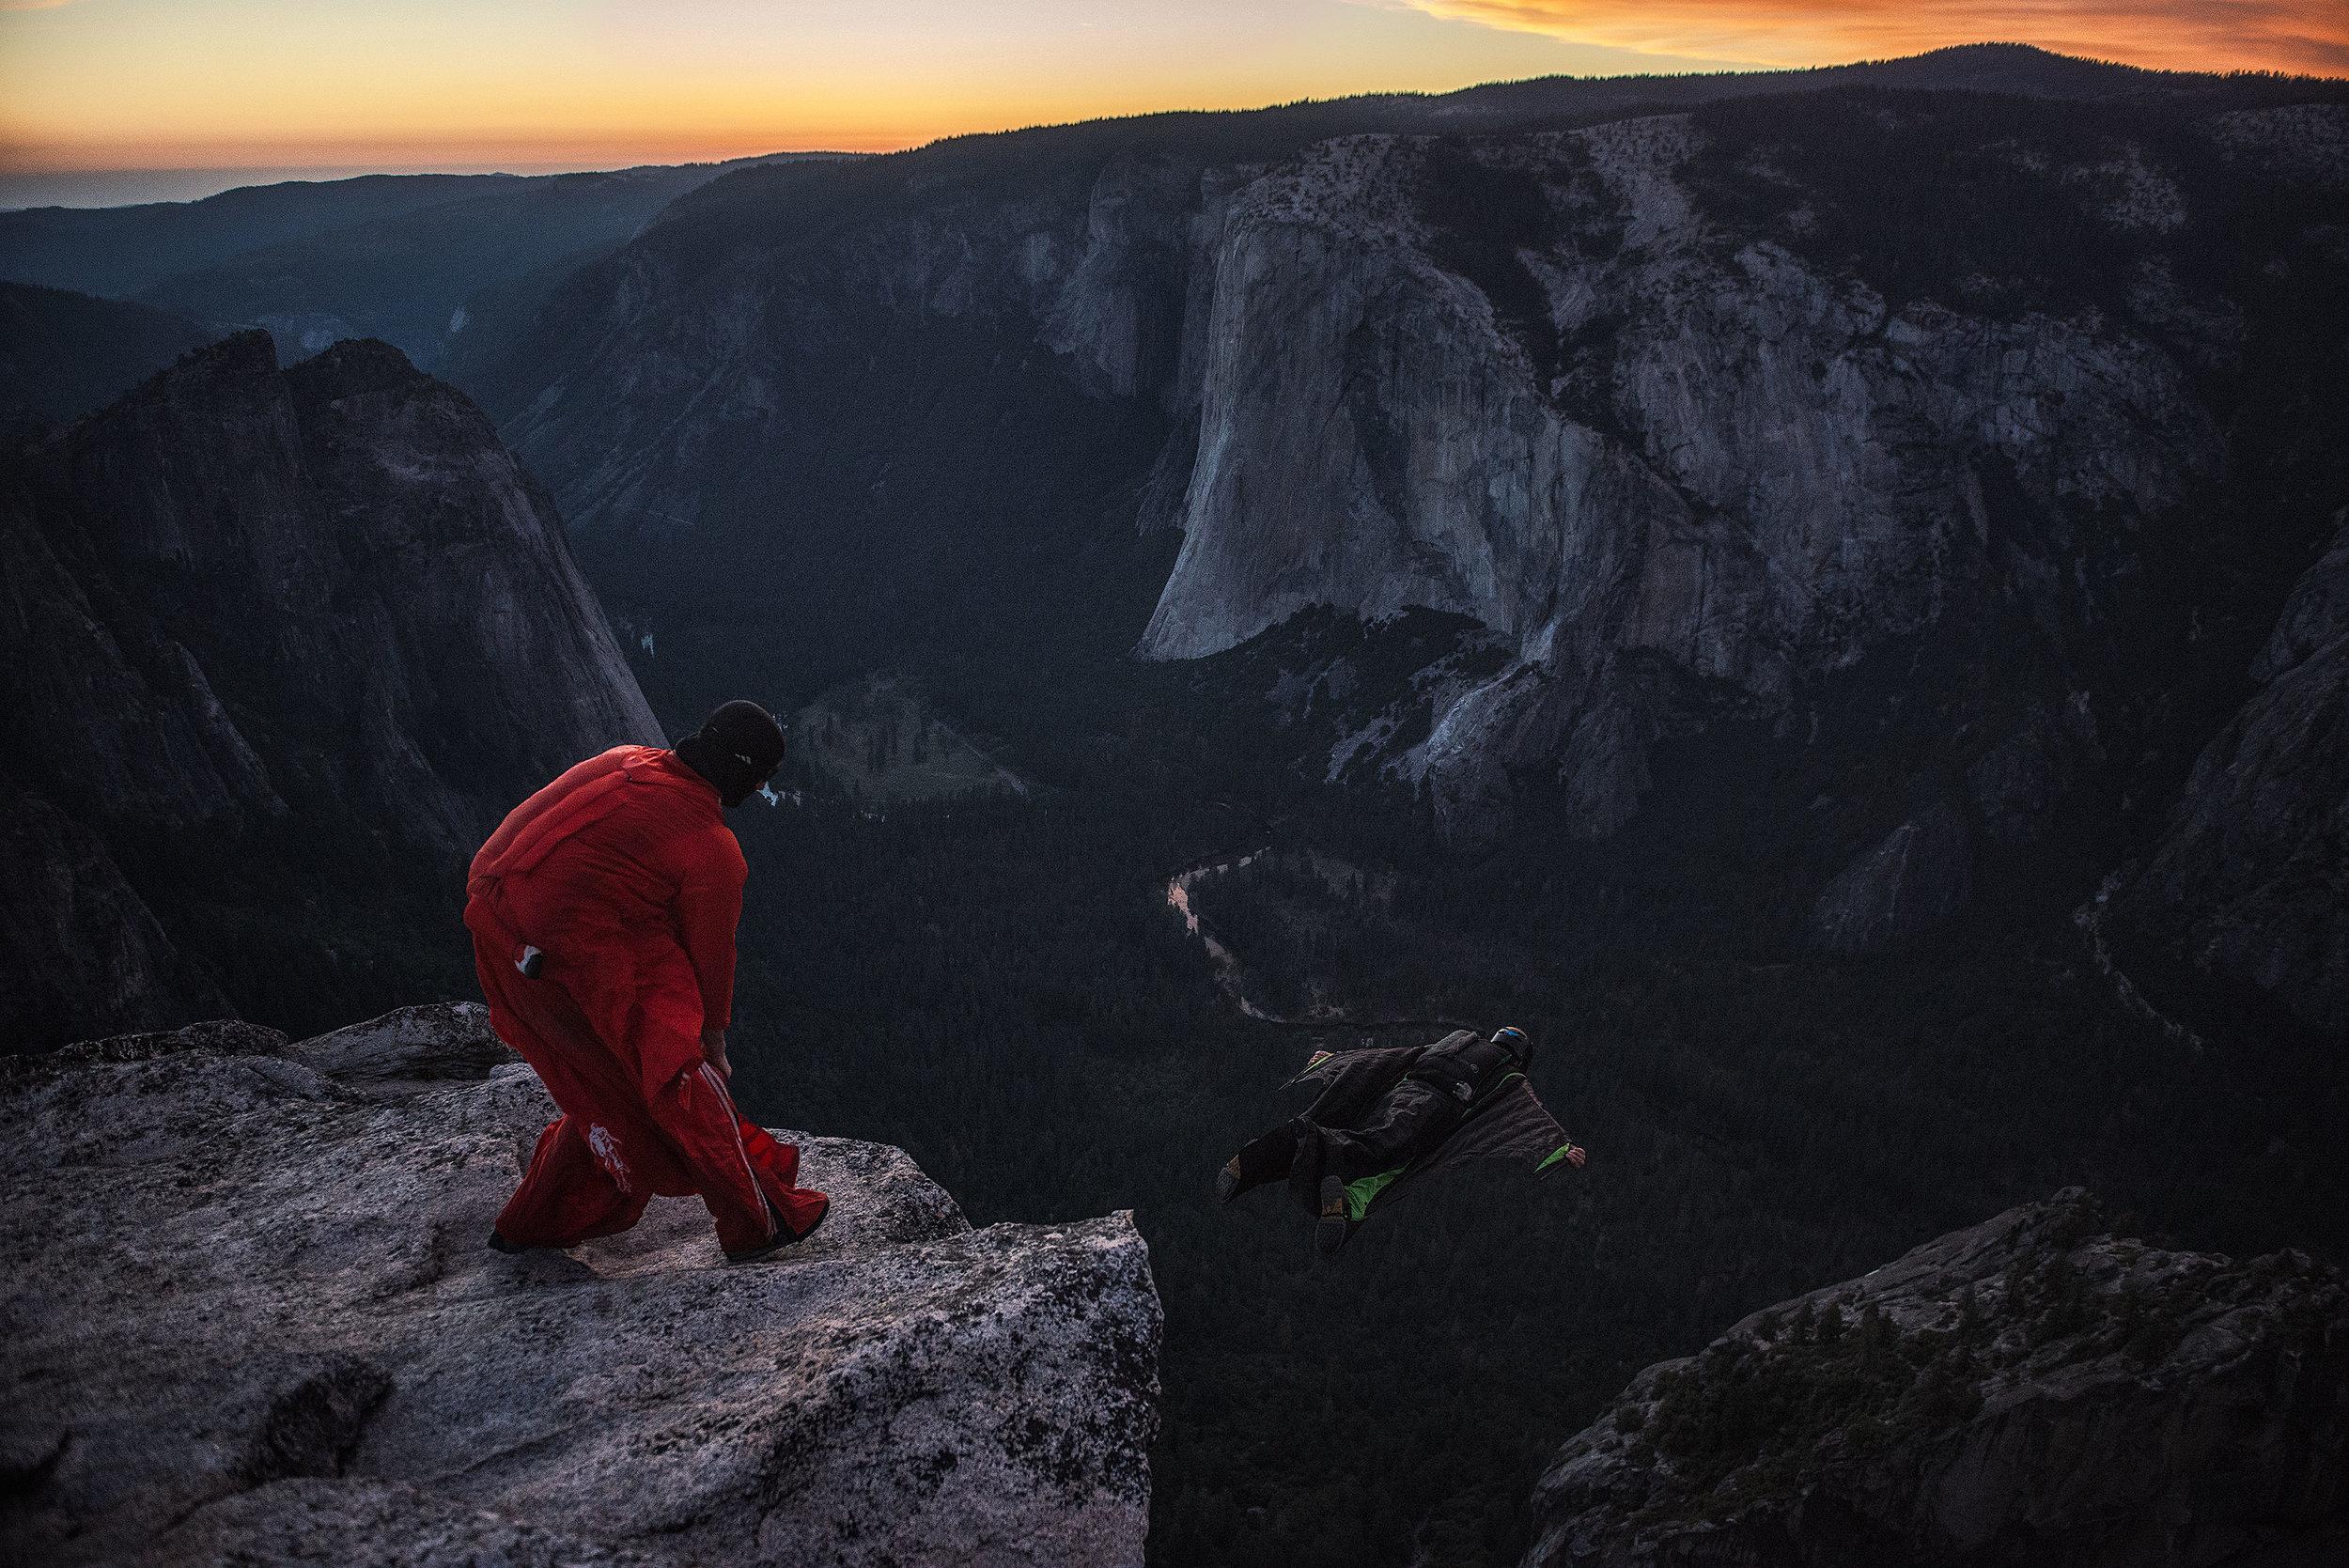 austin-trigg-wing-suit-base-jump-fly-taft-point-dean-potter-yosemite-lifestyle-california-adventure-thrill-seeking-sunset-flying.jpg